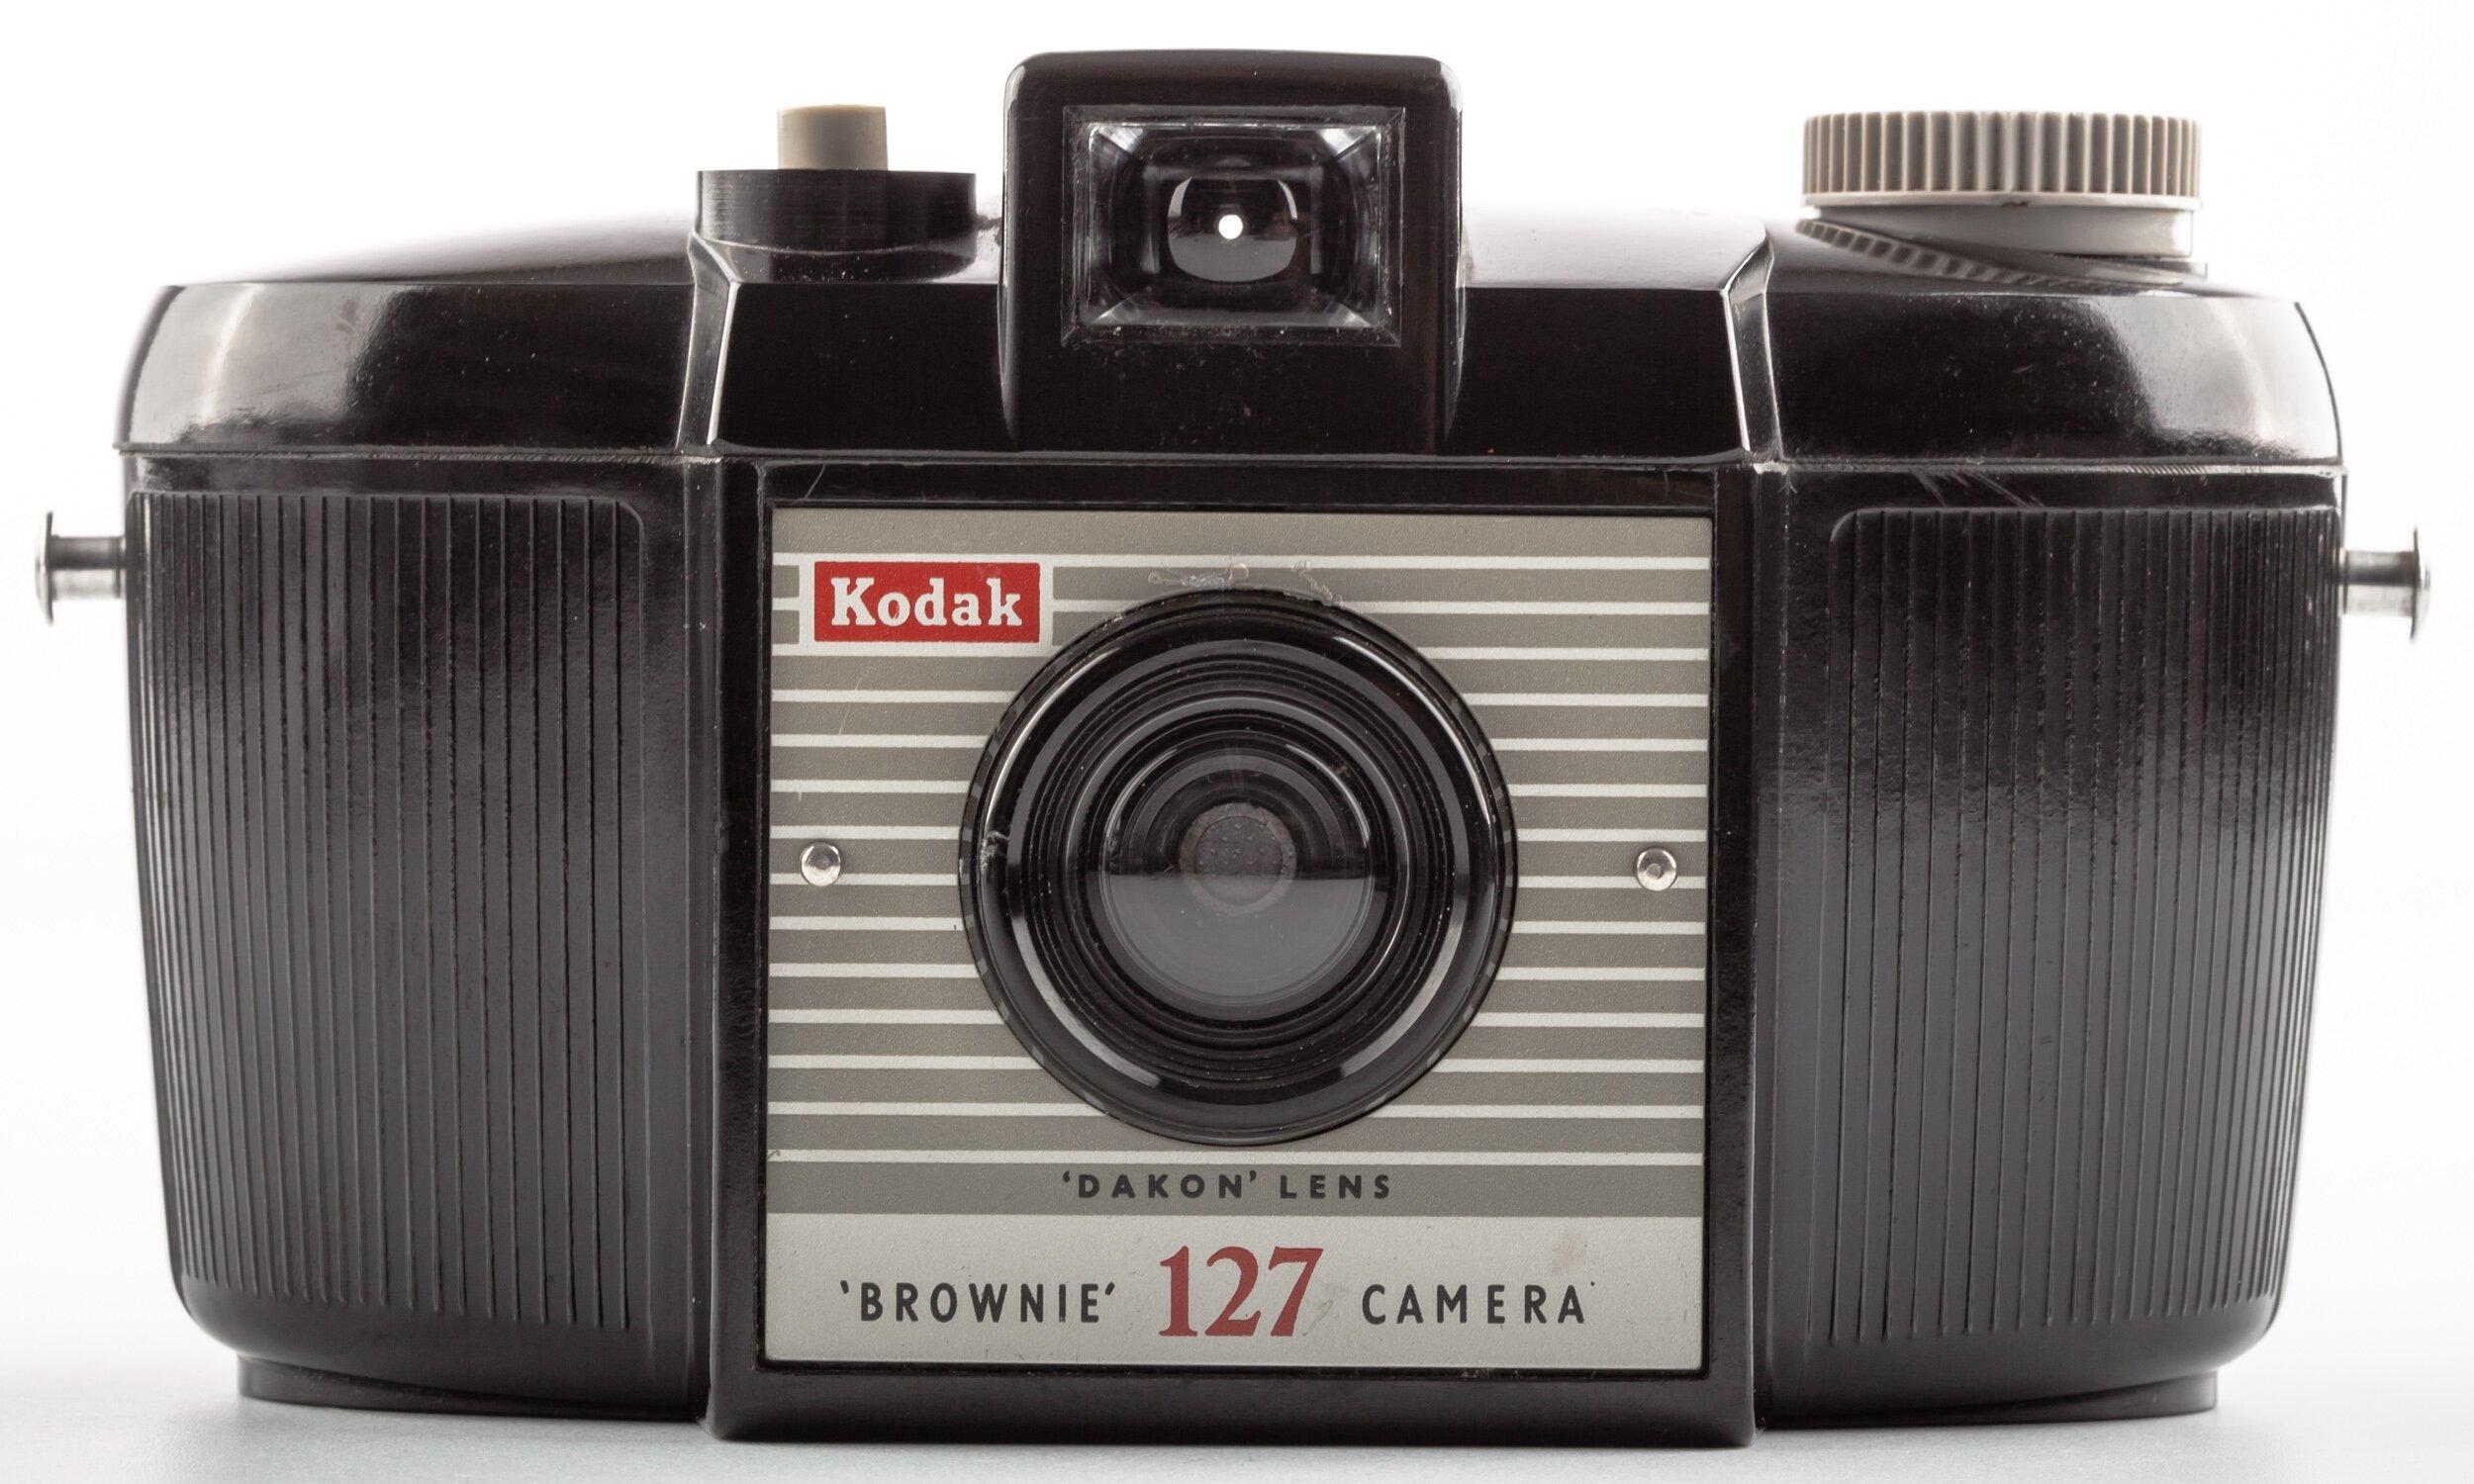 Kodak Brownie 127 Kamera